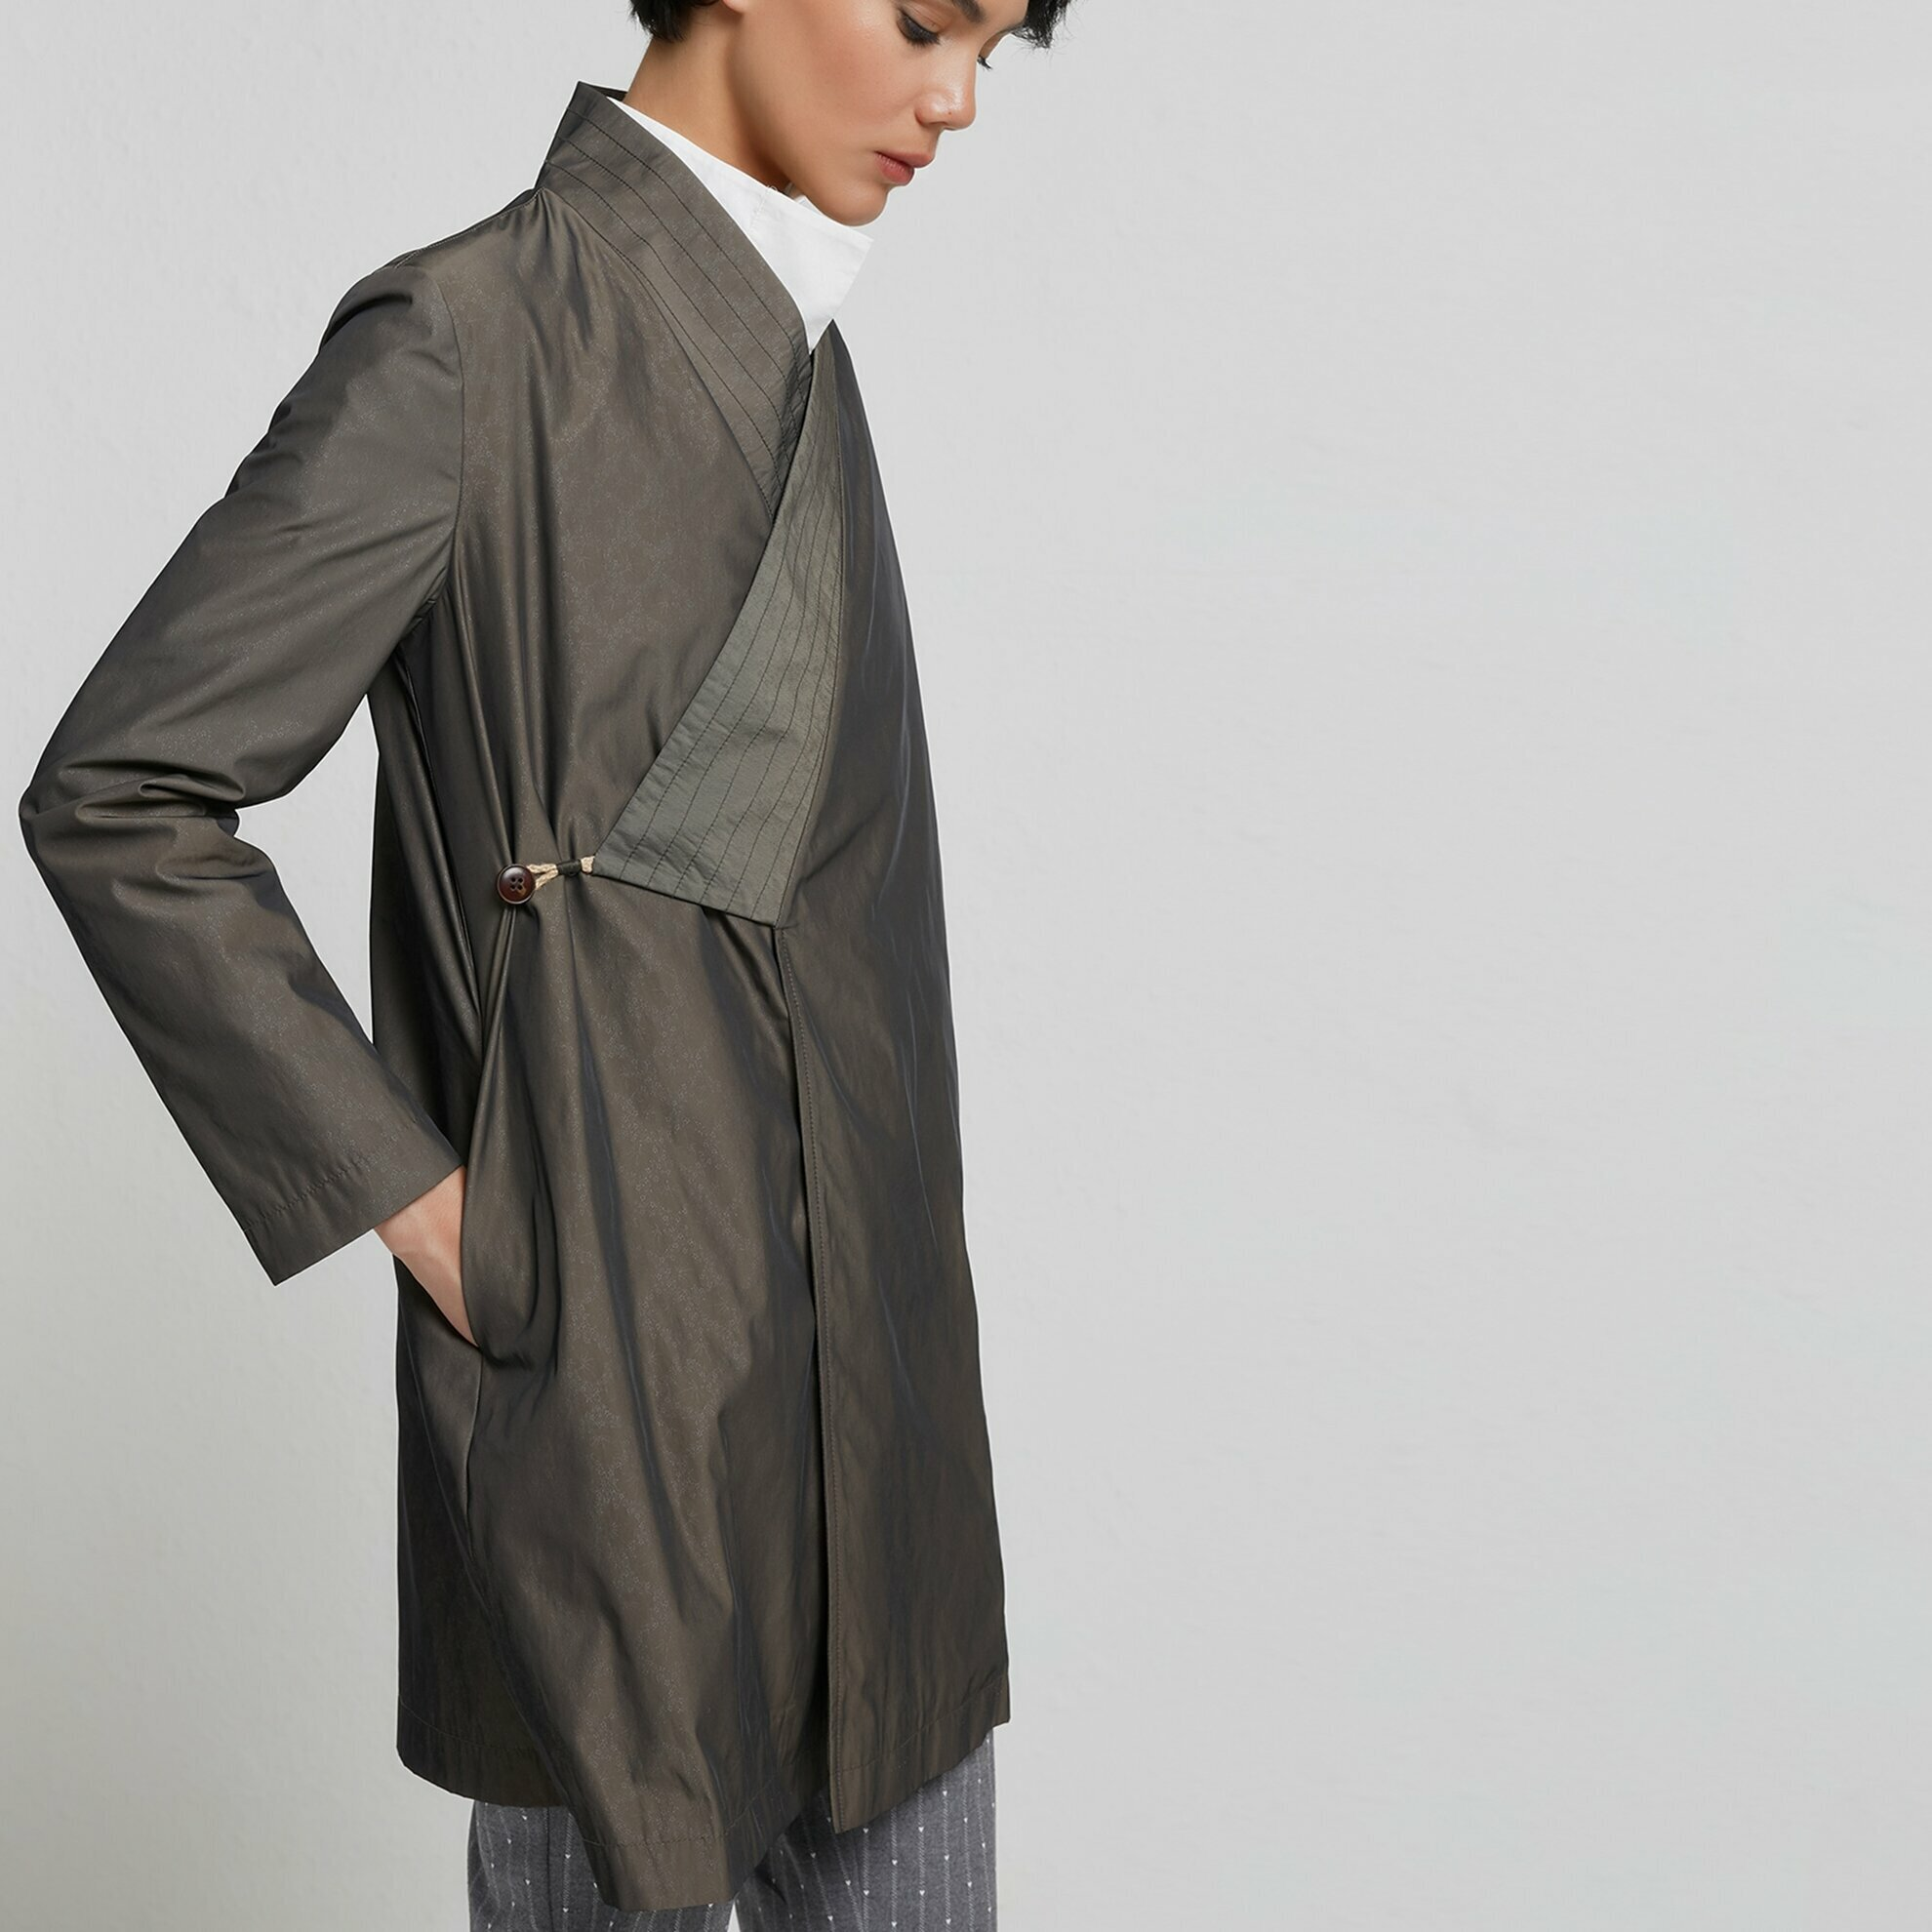 Damen Kimono-Mantel